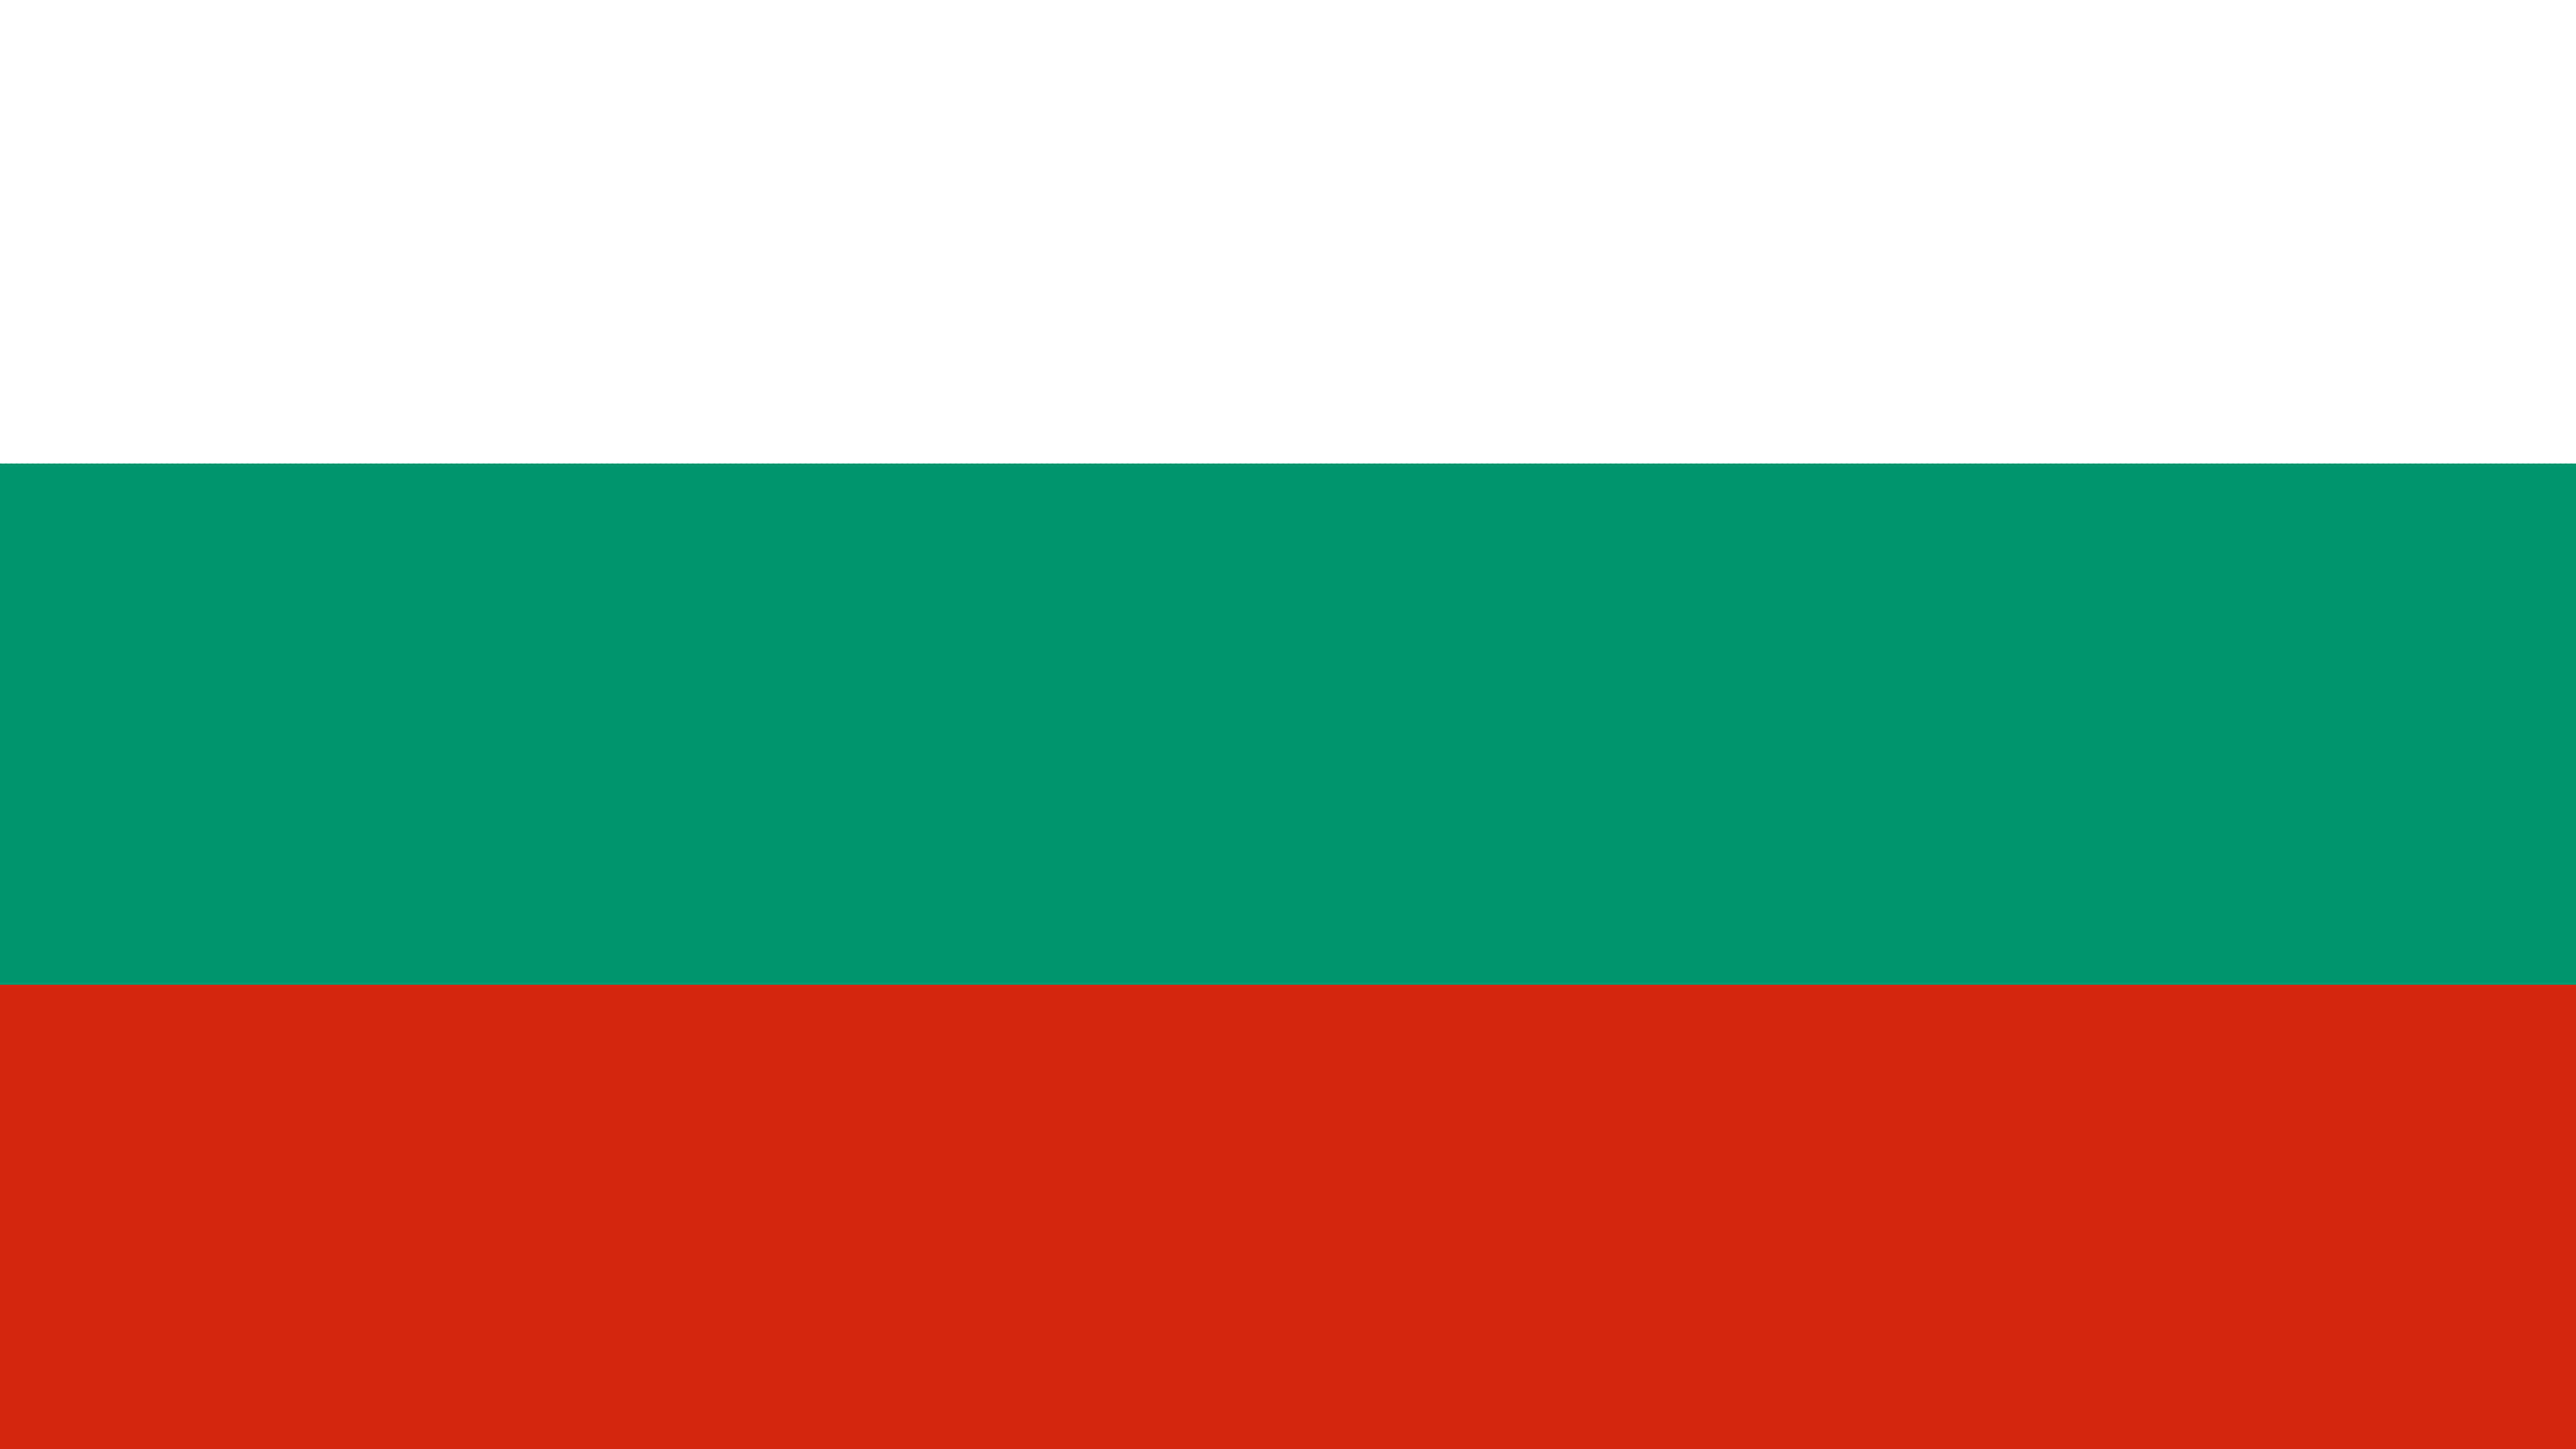 bulgaria flag uhd 4k wallpaper